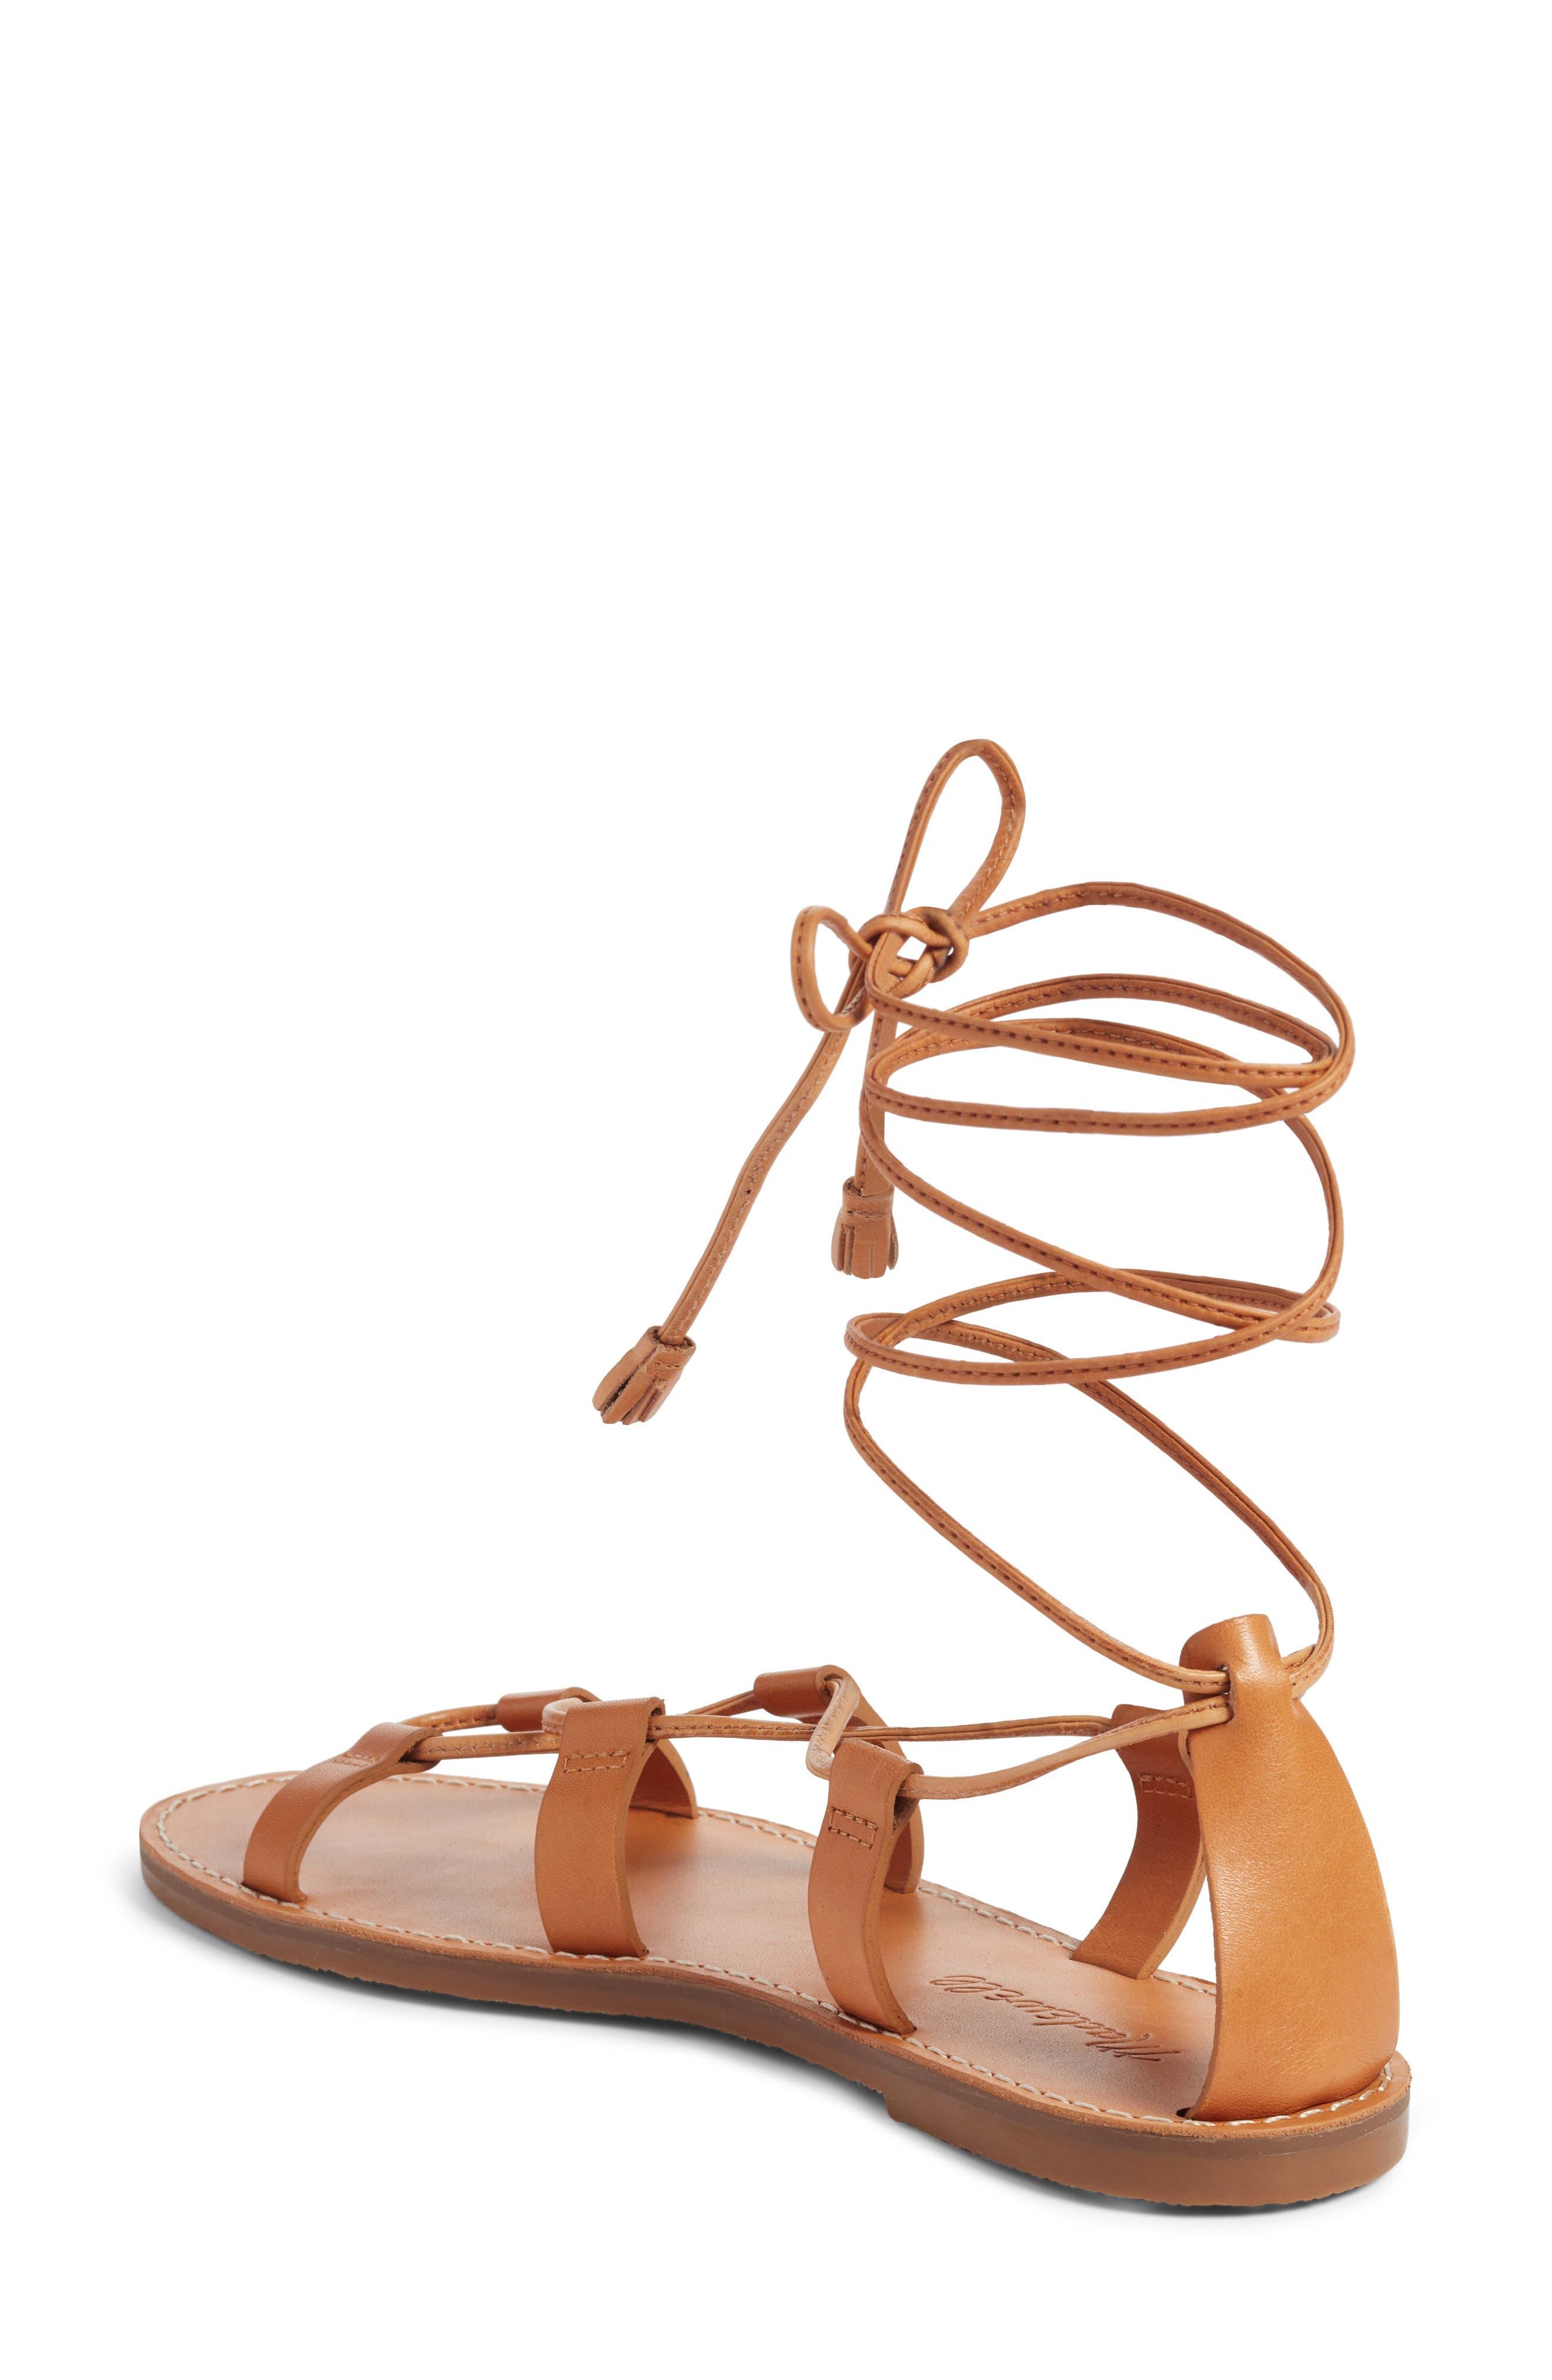 The Boardwalk Lace-Up Sandal,                             Alternate thumbnail 2, color,                             DESERT CAMEL LEATHER